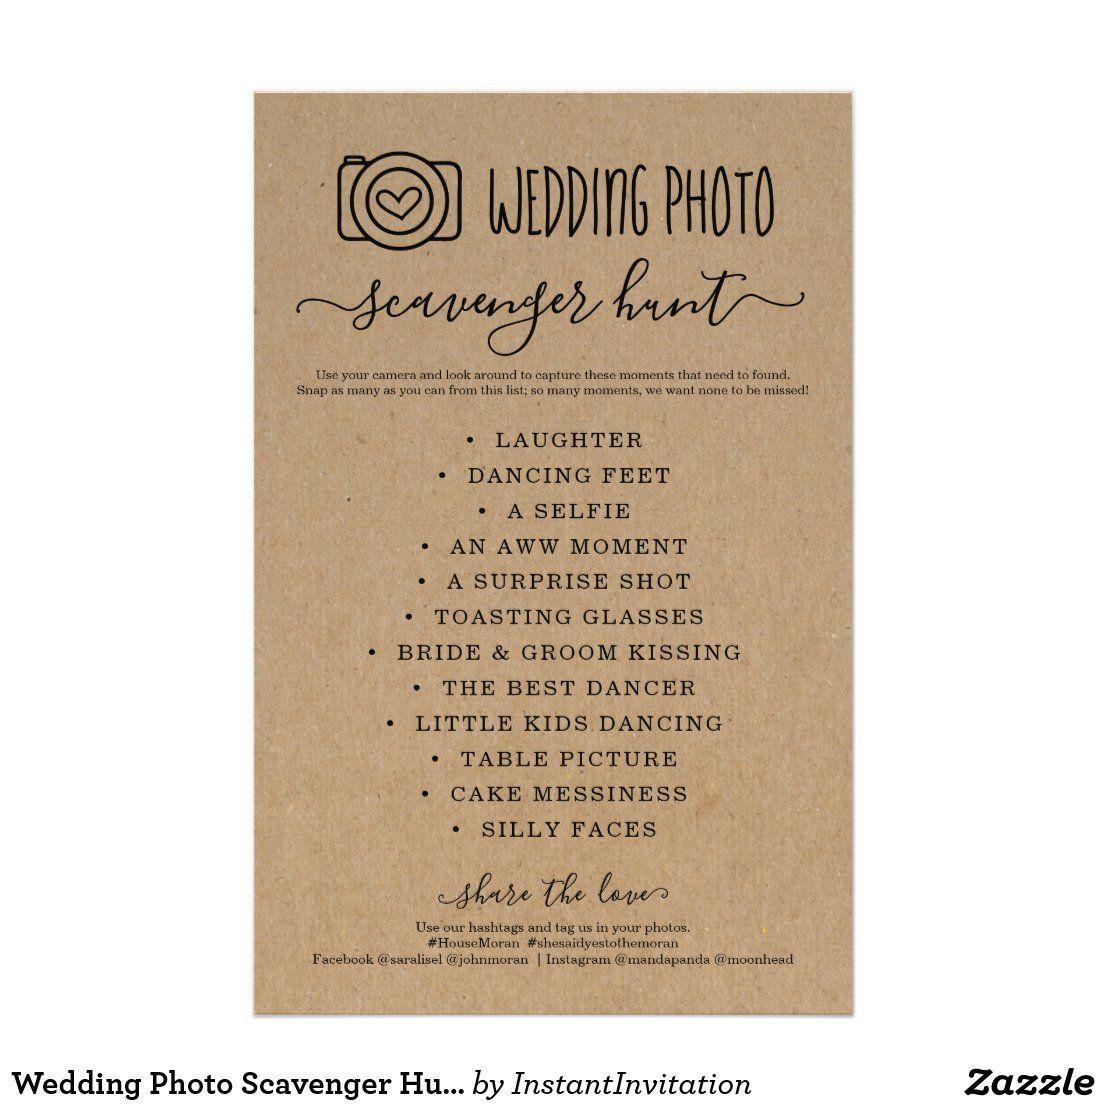 Wedding Photo Scavenger Hunt I Spy Game Kraft Flyer | Zazzle.com -   18 wedding Games for money ideas